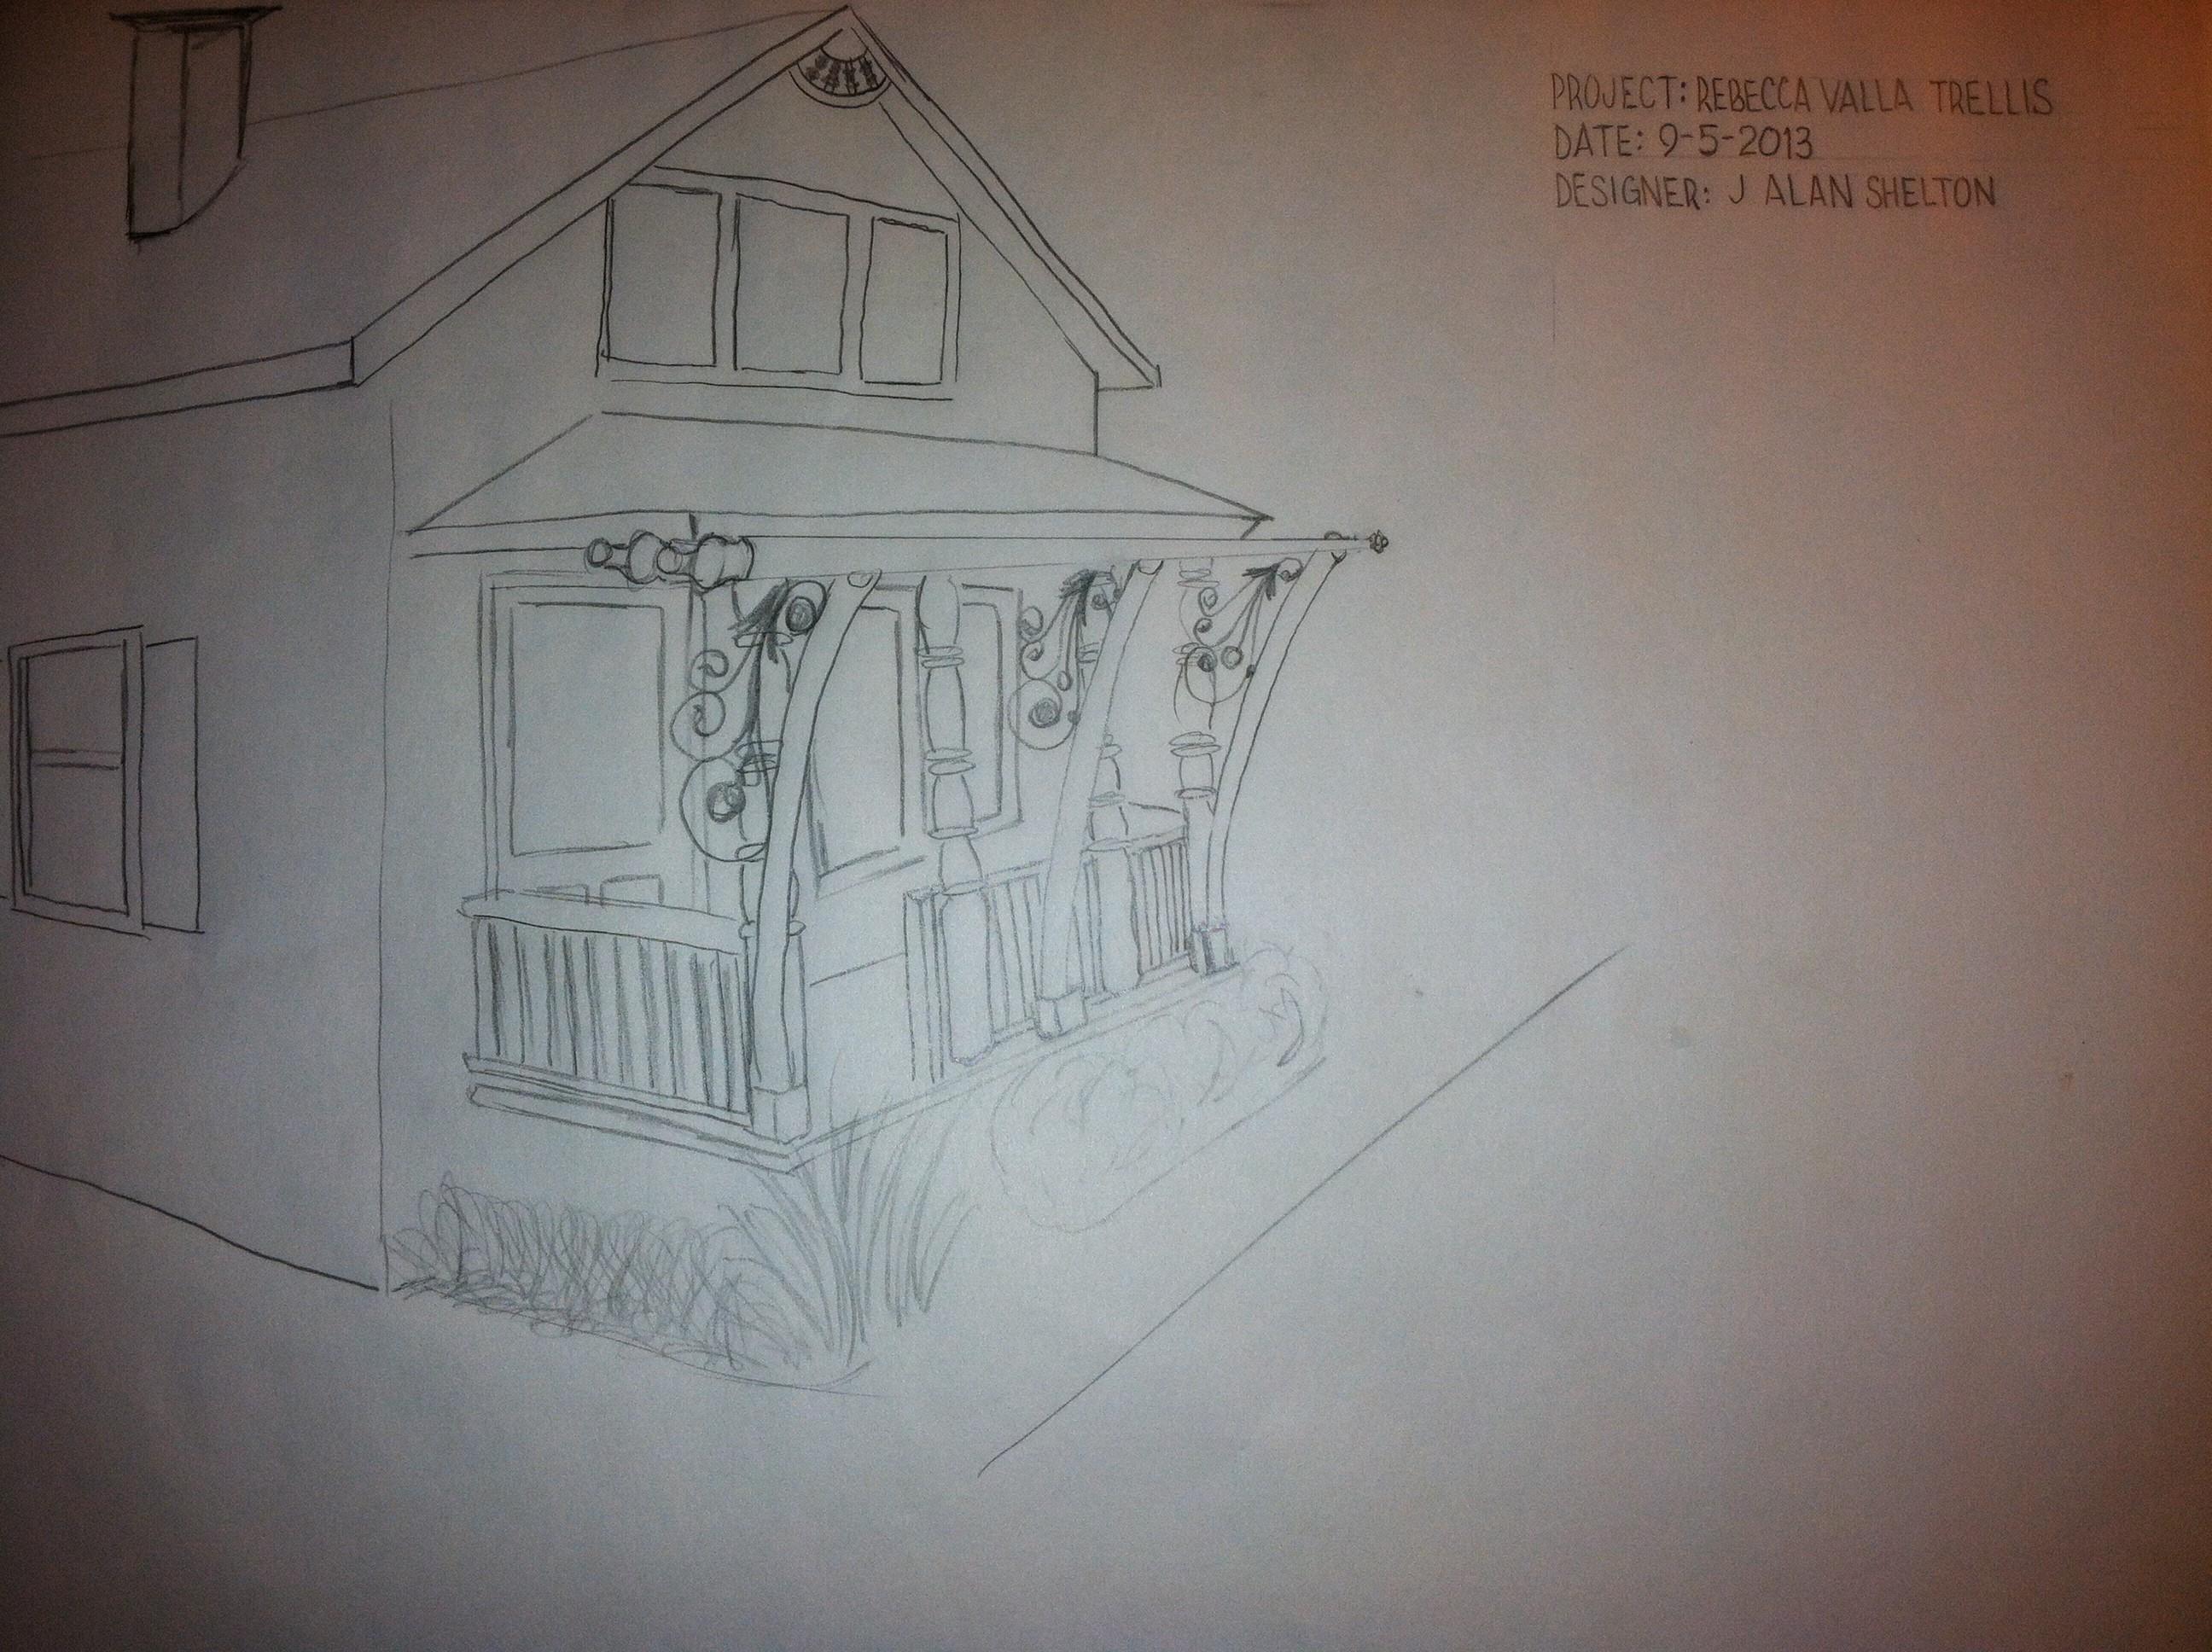 Wrought Iron and steel tubing garden trellis design